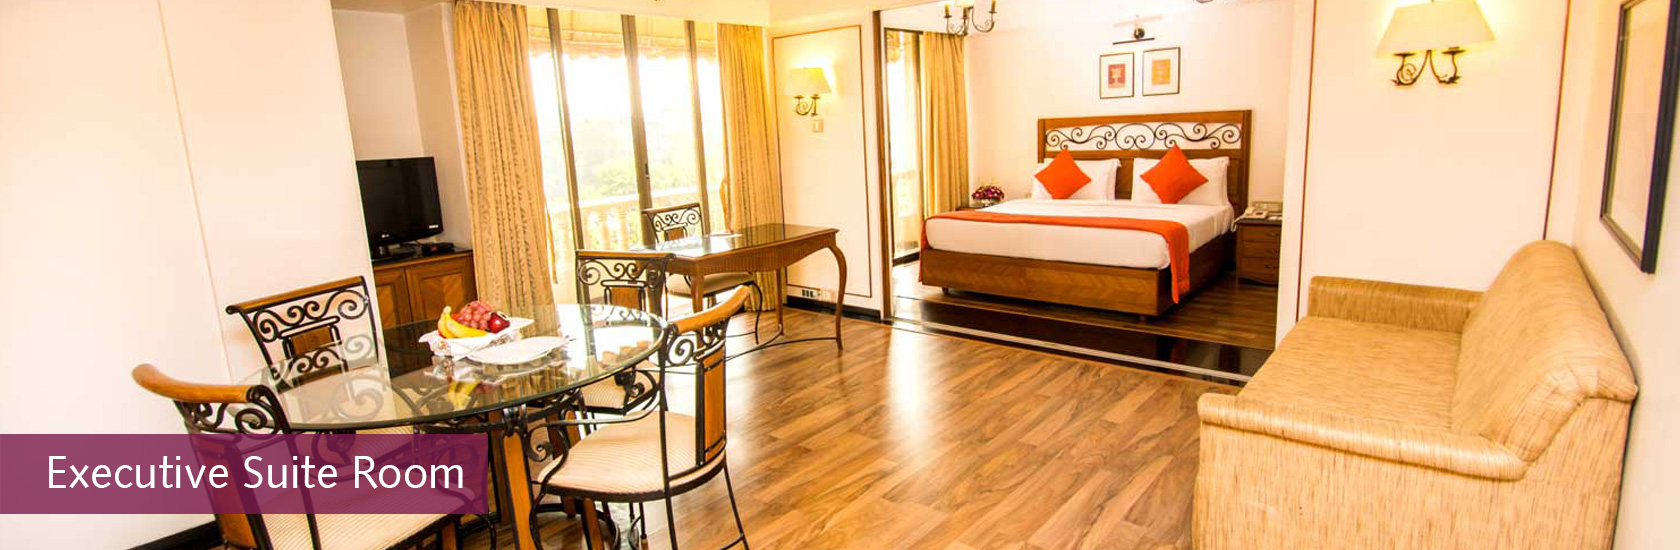 privaterooms in navi mumbai for 2 hours